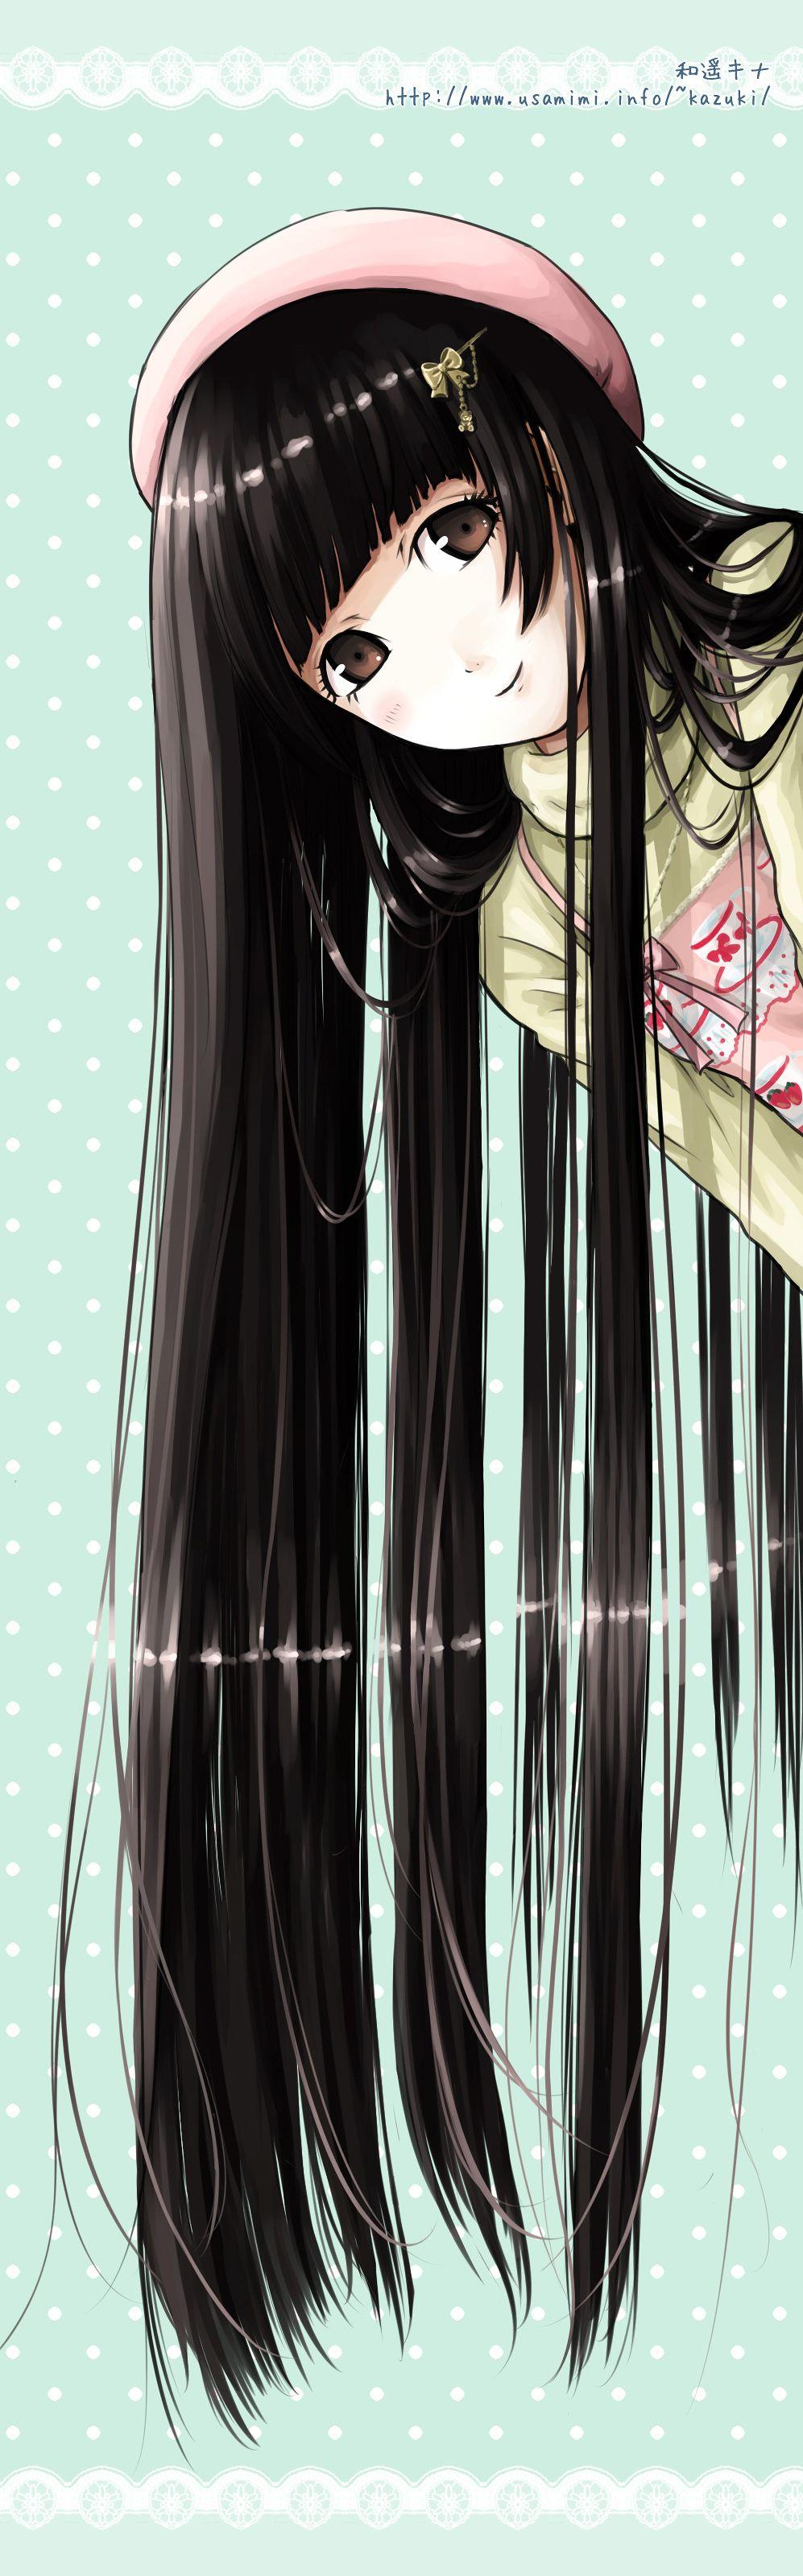 Looooong Straight Black Hair With Straight Bangs Original Illustration By Kazuharu Kina Anime Anime Artwork Manga Drawing